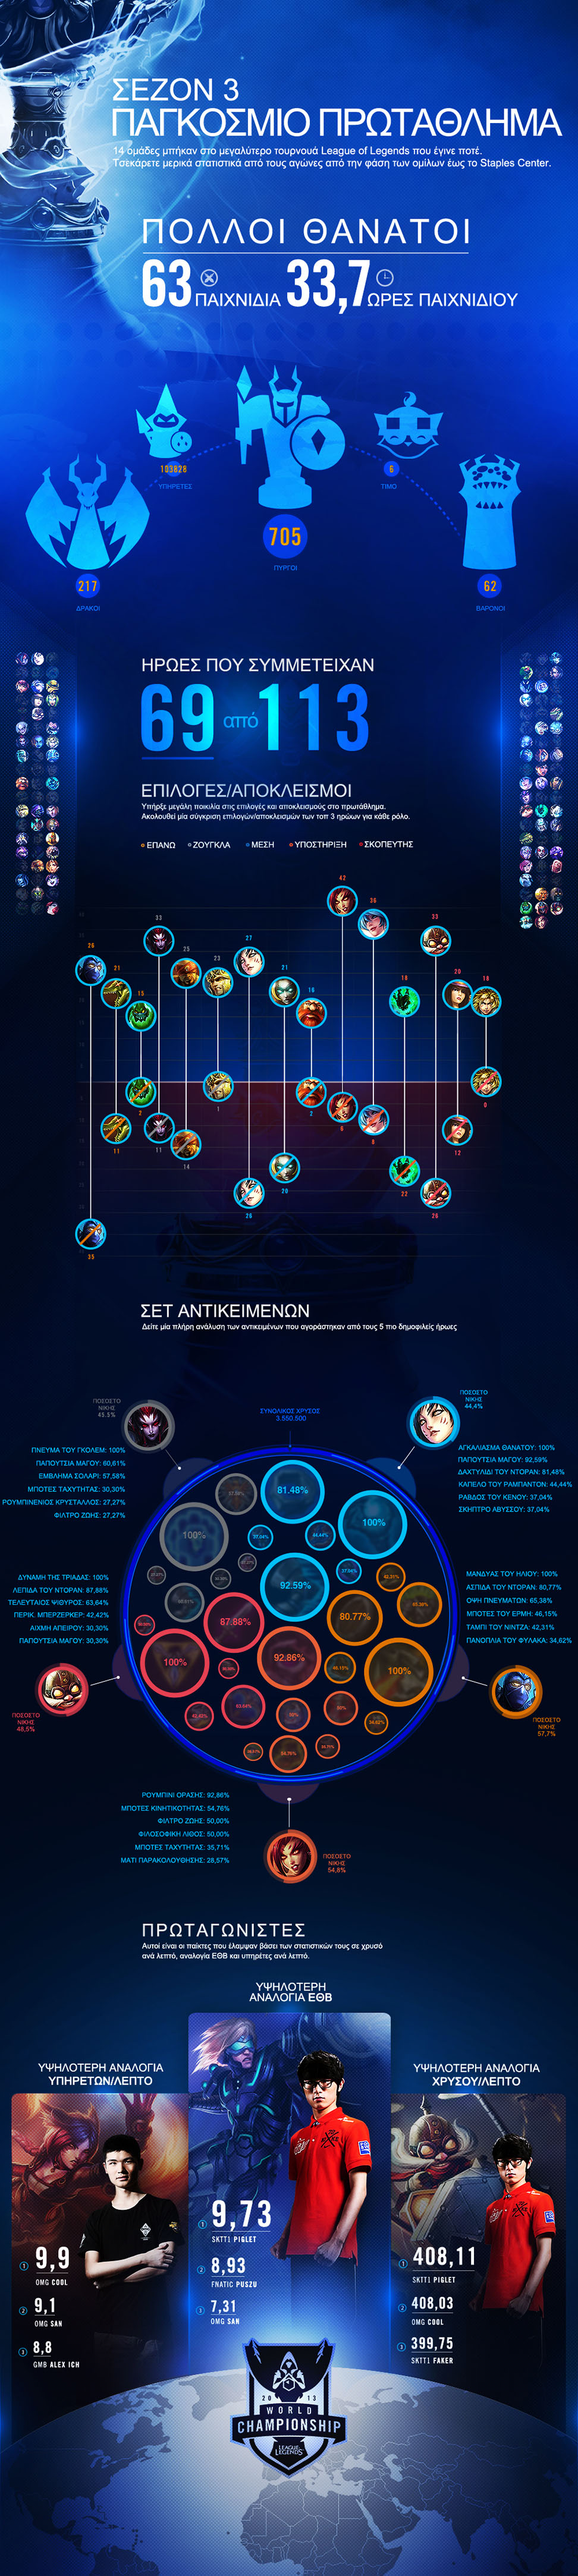 league-of-legends-season-3-infographic-greek